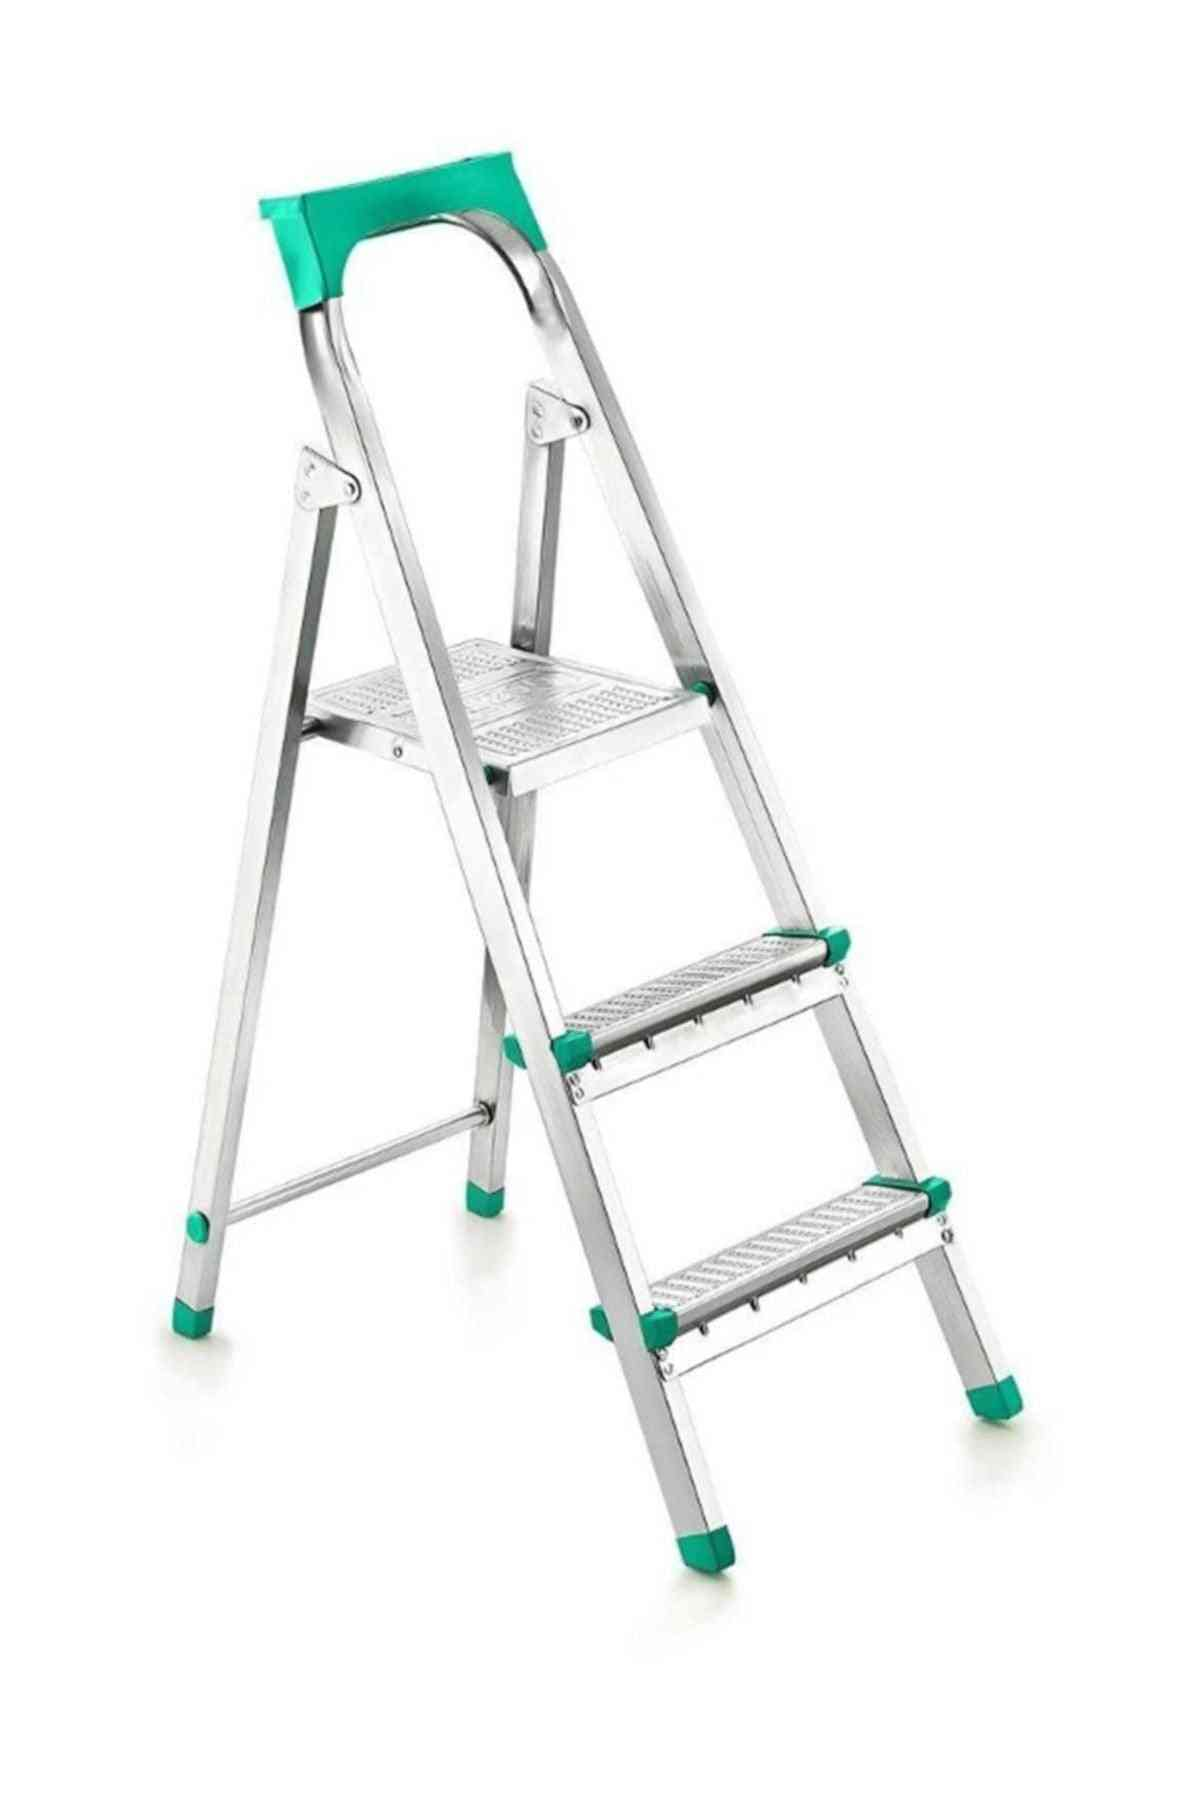 Gl 200 2 + 1 Digit Folding Ladder